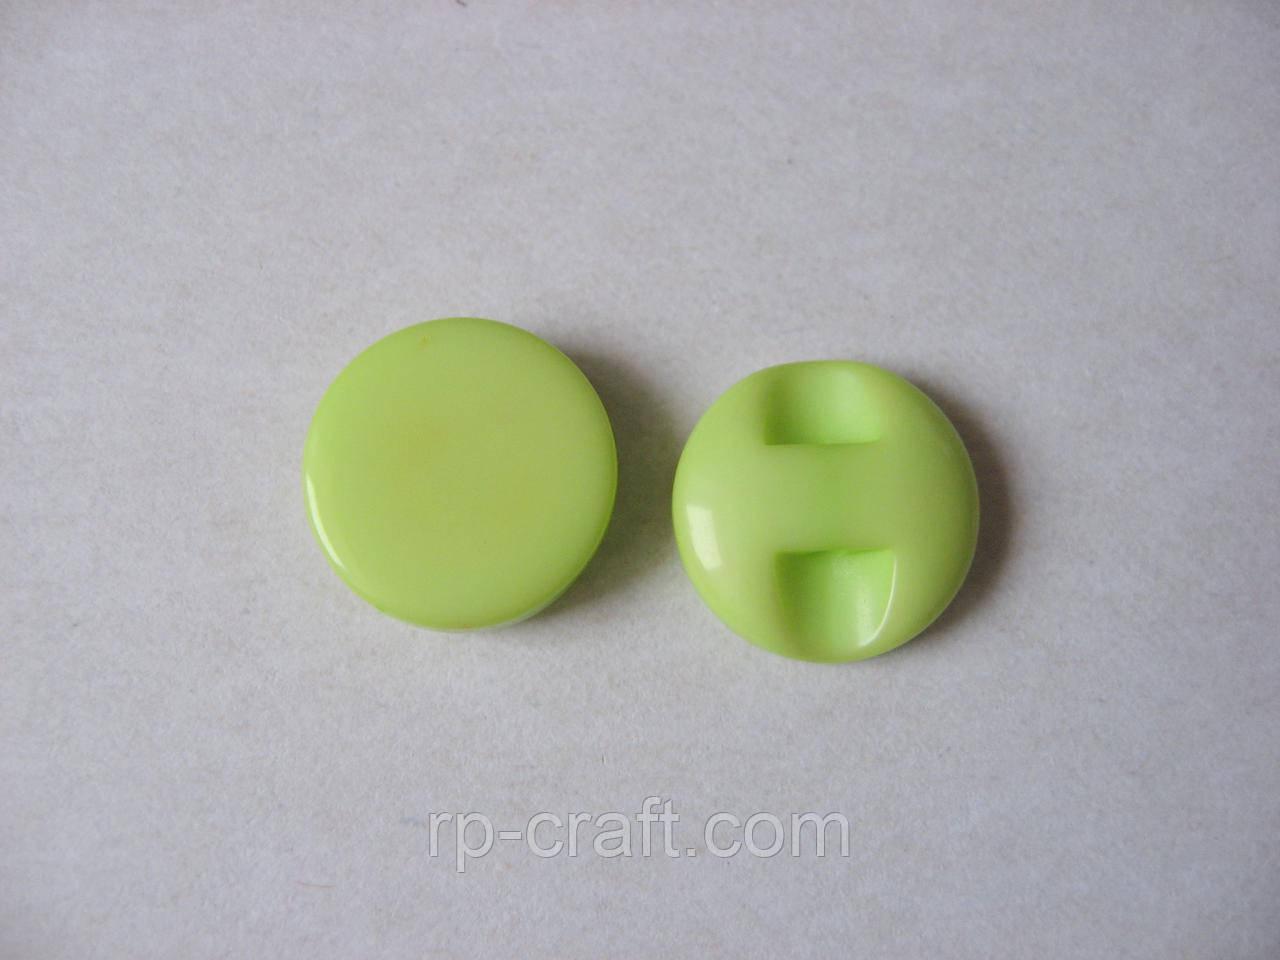 Пуговица пластиковая, декоративная, круглая, на ножке, 13 мм